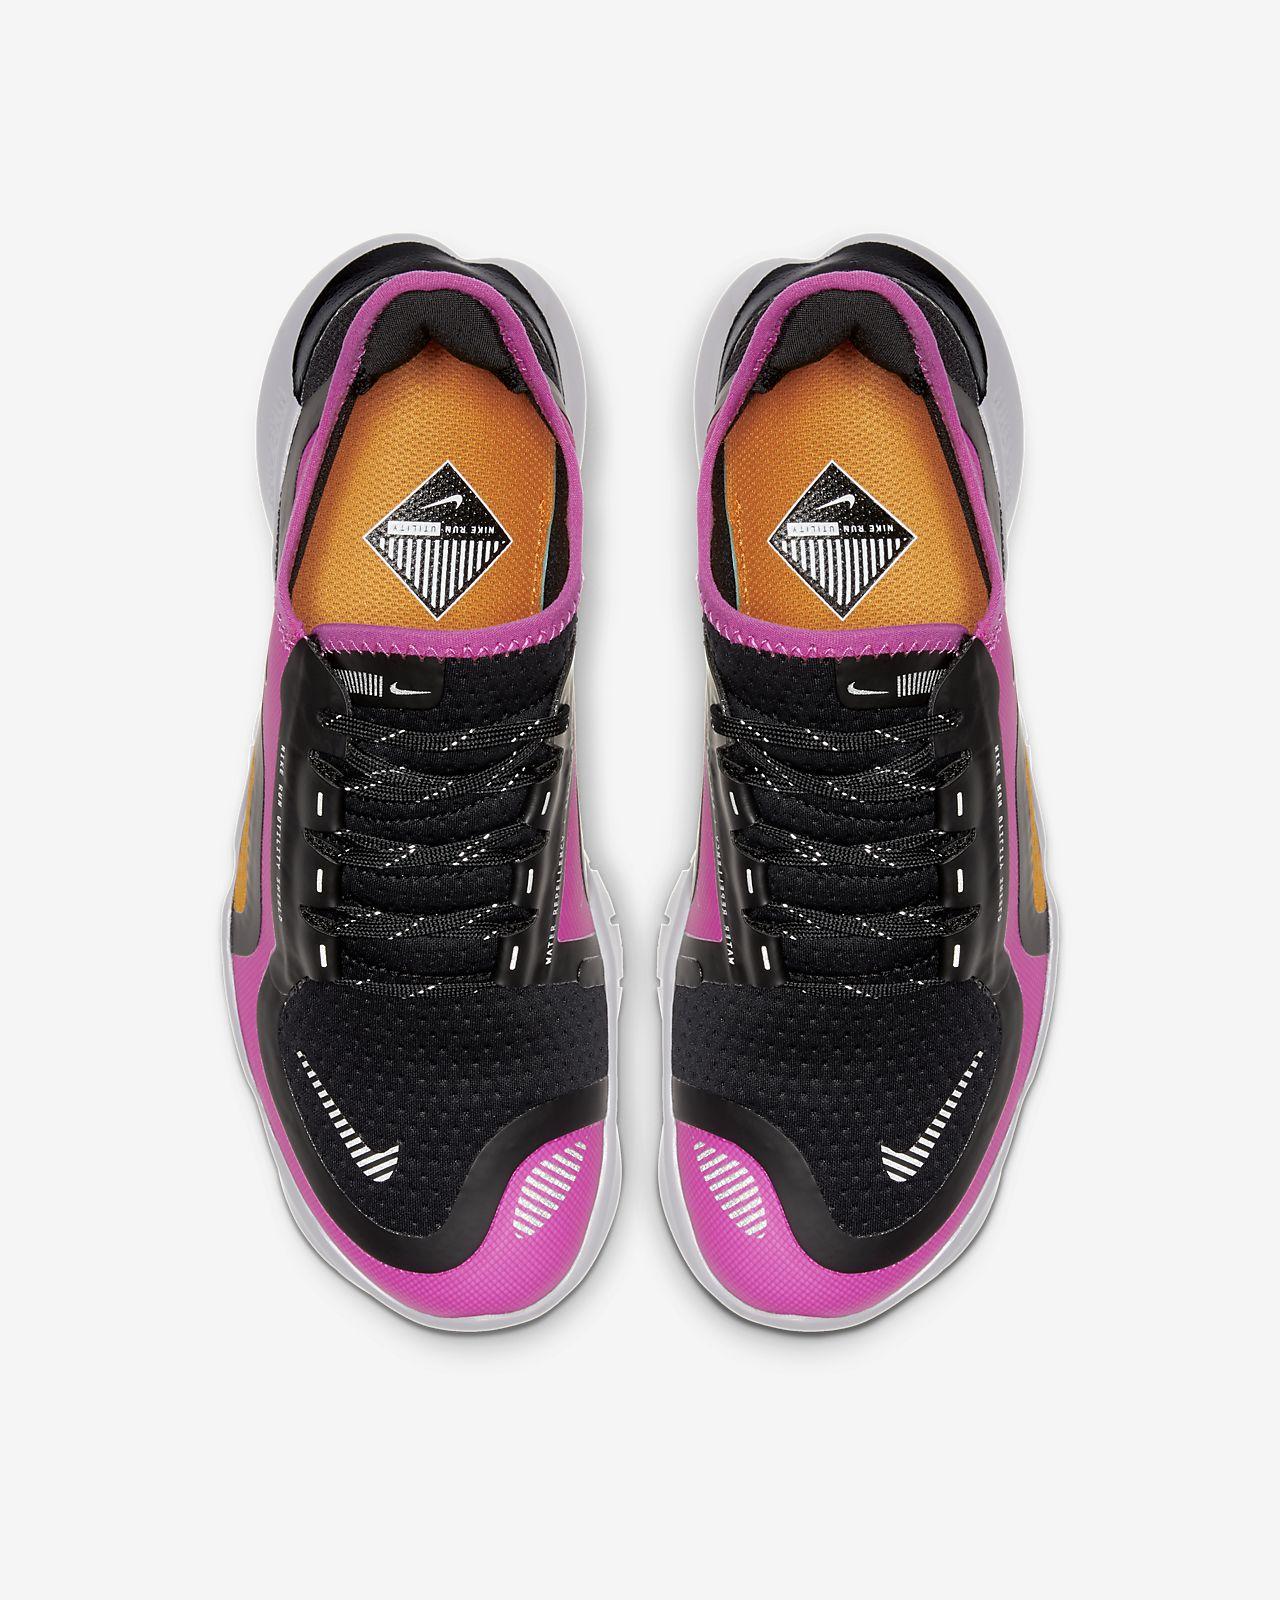 Chaussure de running Nike Free RN 5.0 Shield pour Femme